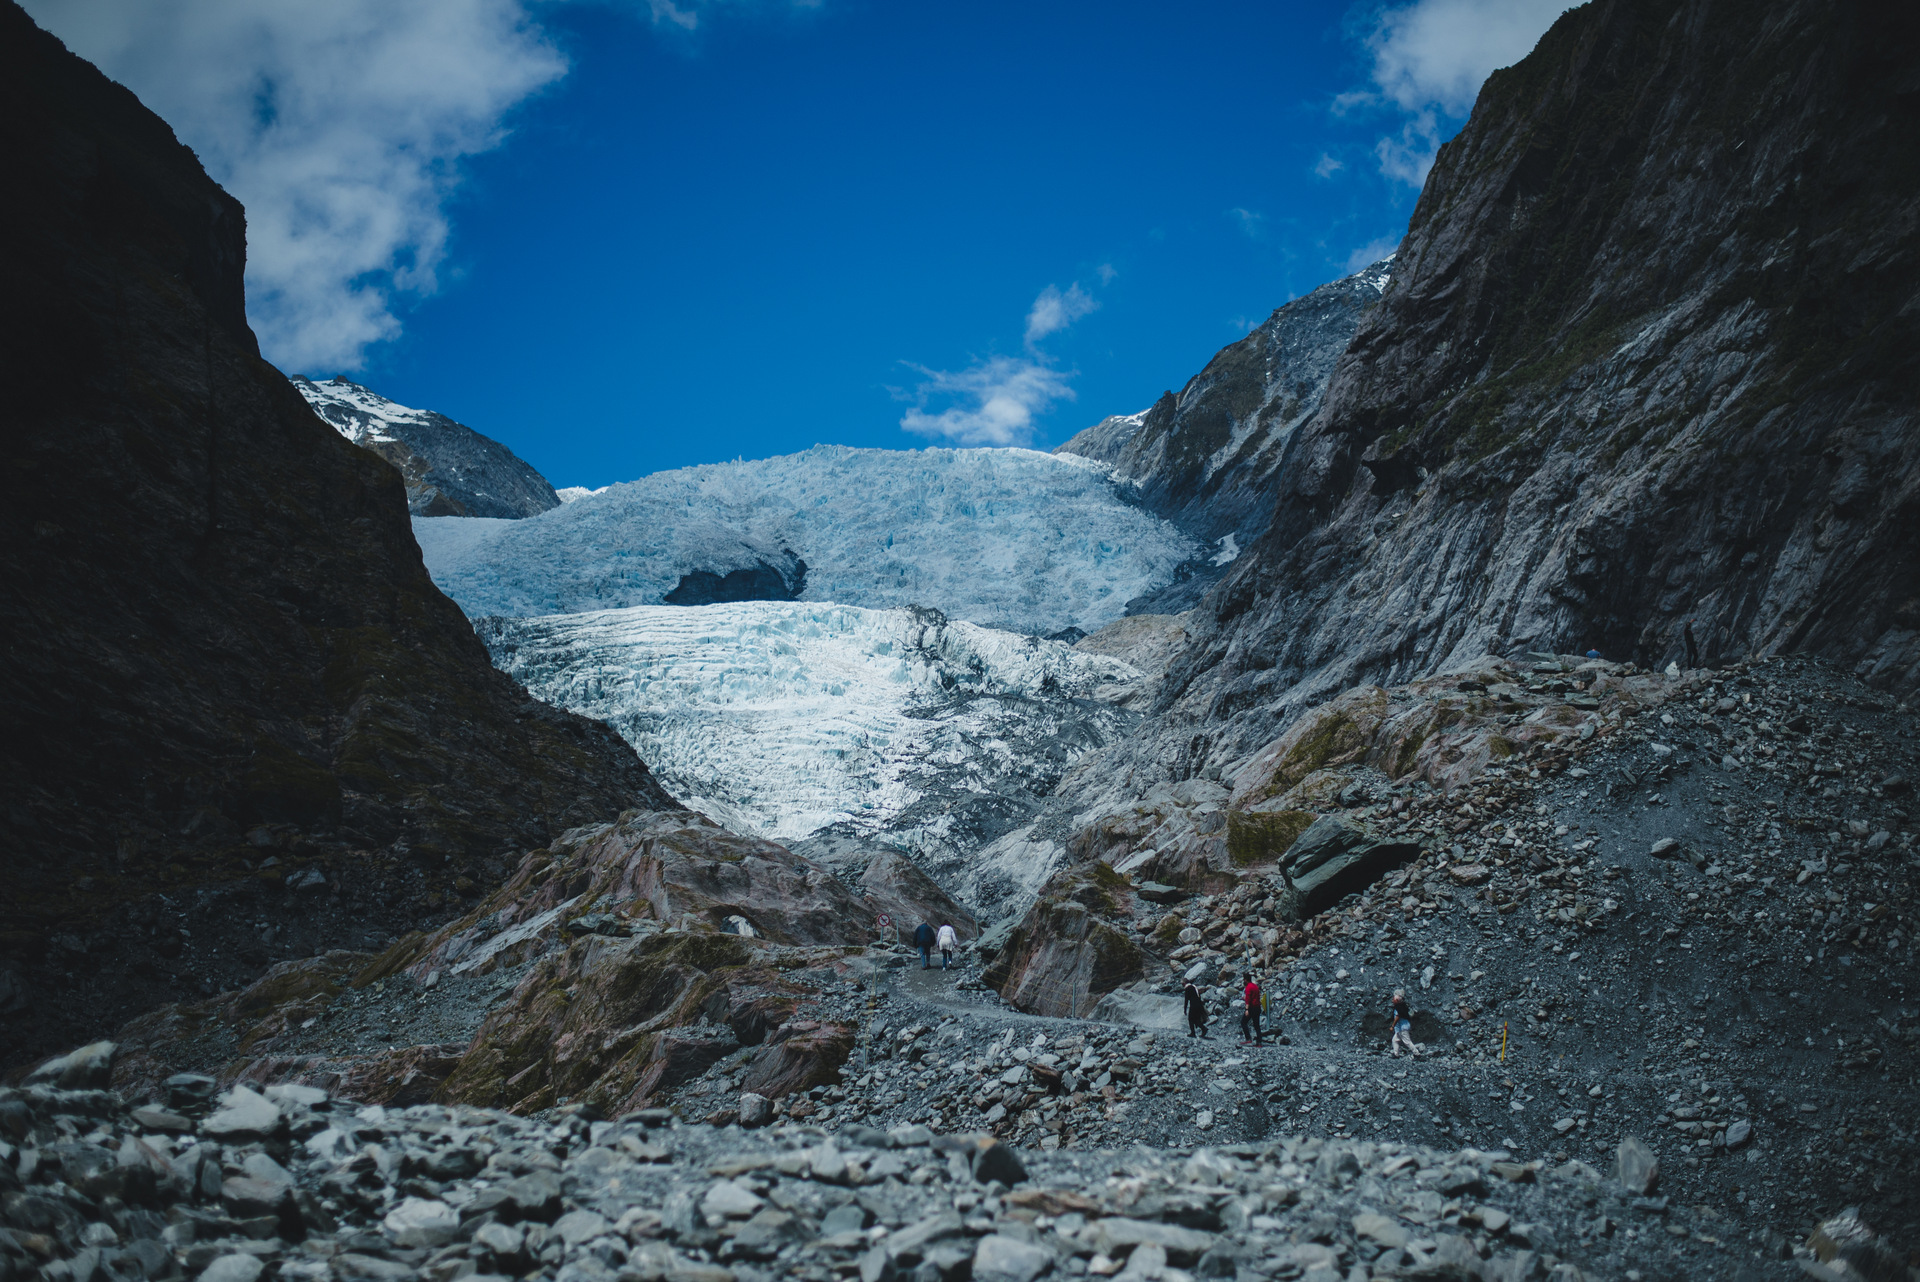 lodowieca foxa nowa zelandia